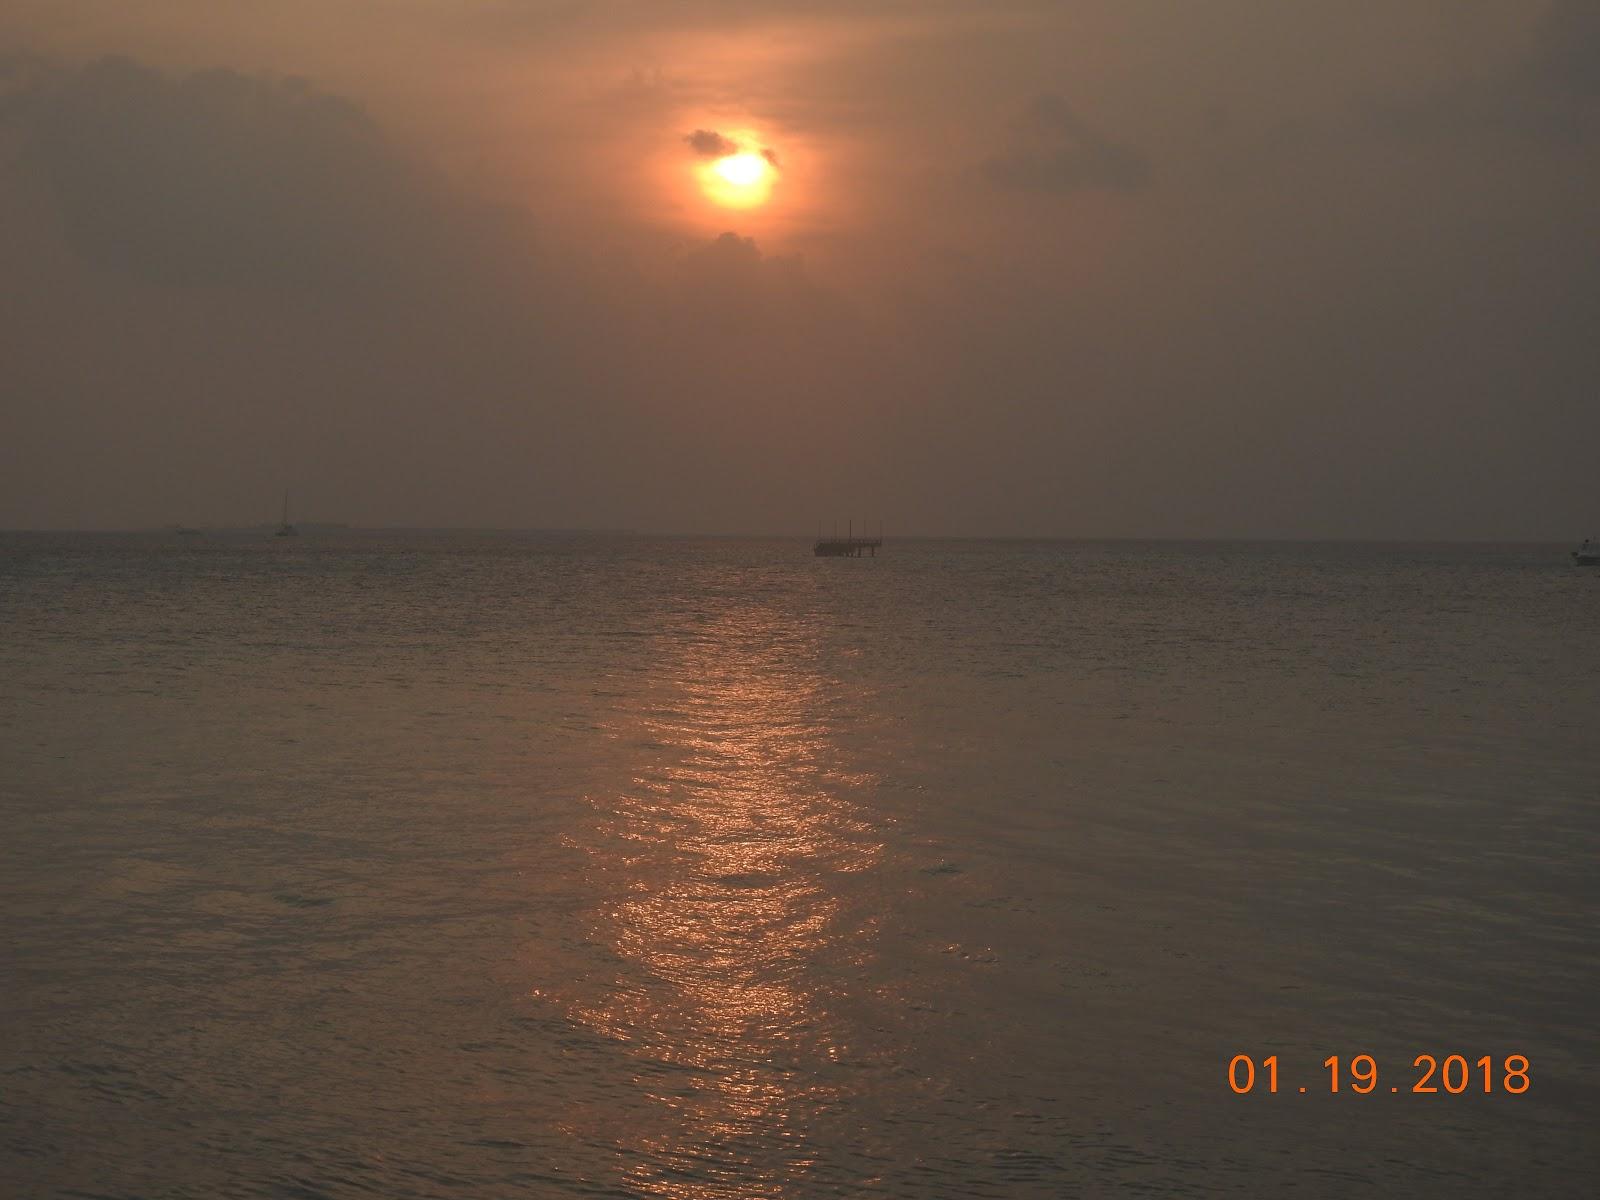 invite-to-paradise-sri-lanka-maldives-holiday-specialists-nutan-vidyut-patel-sunset-2.jpg